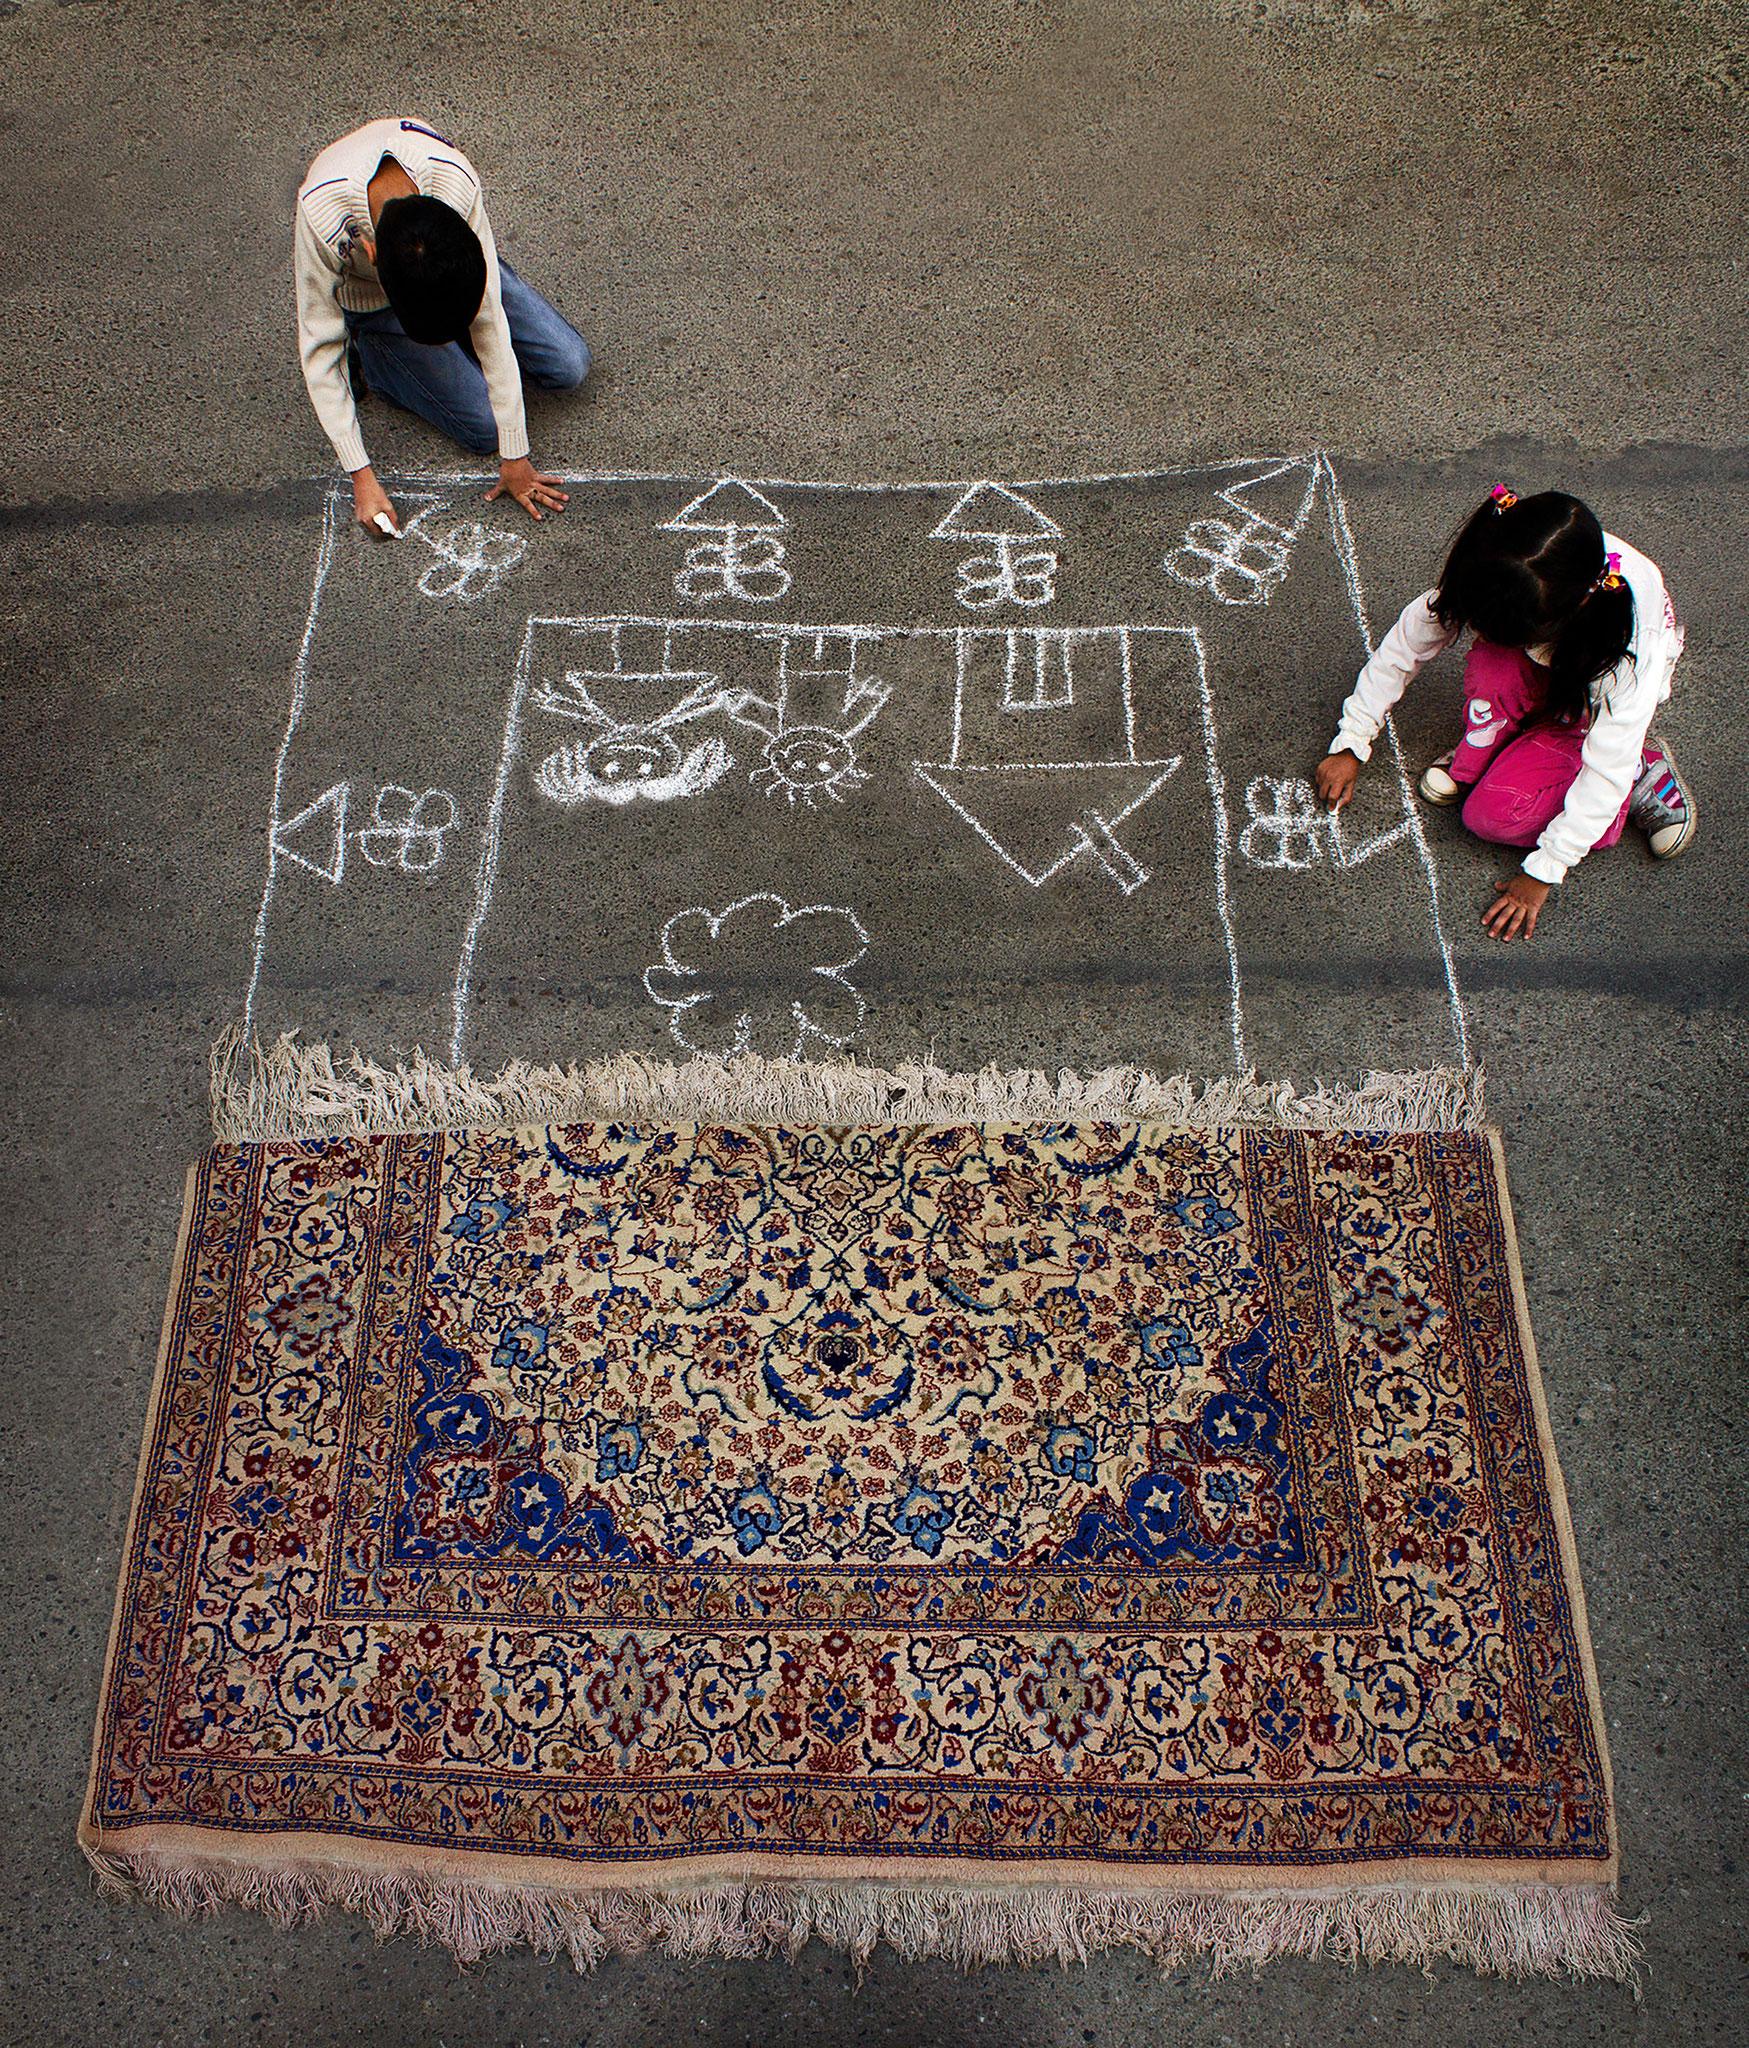 Hadi  Dehghanpour  (Iran) - Anima